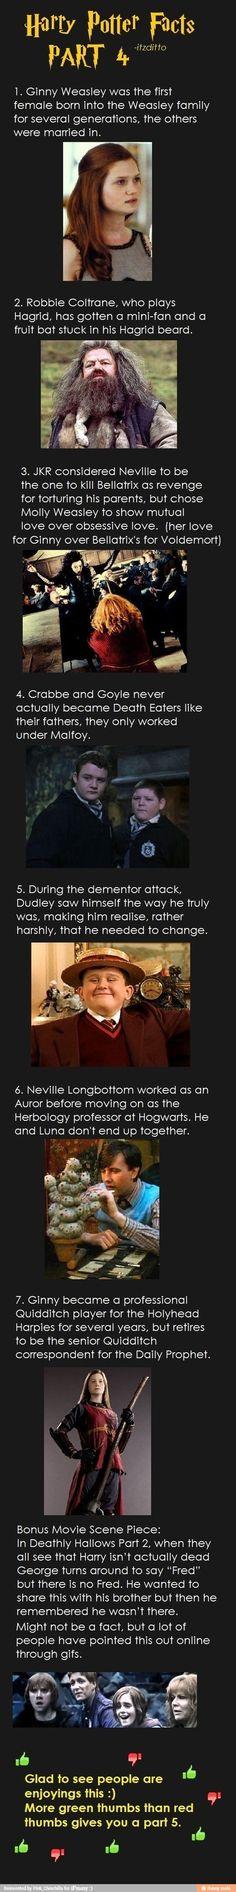 Harry Potter Fact 6 makes me sad....Luna+Neville= <3